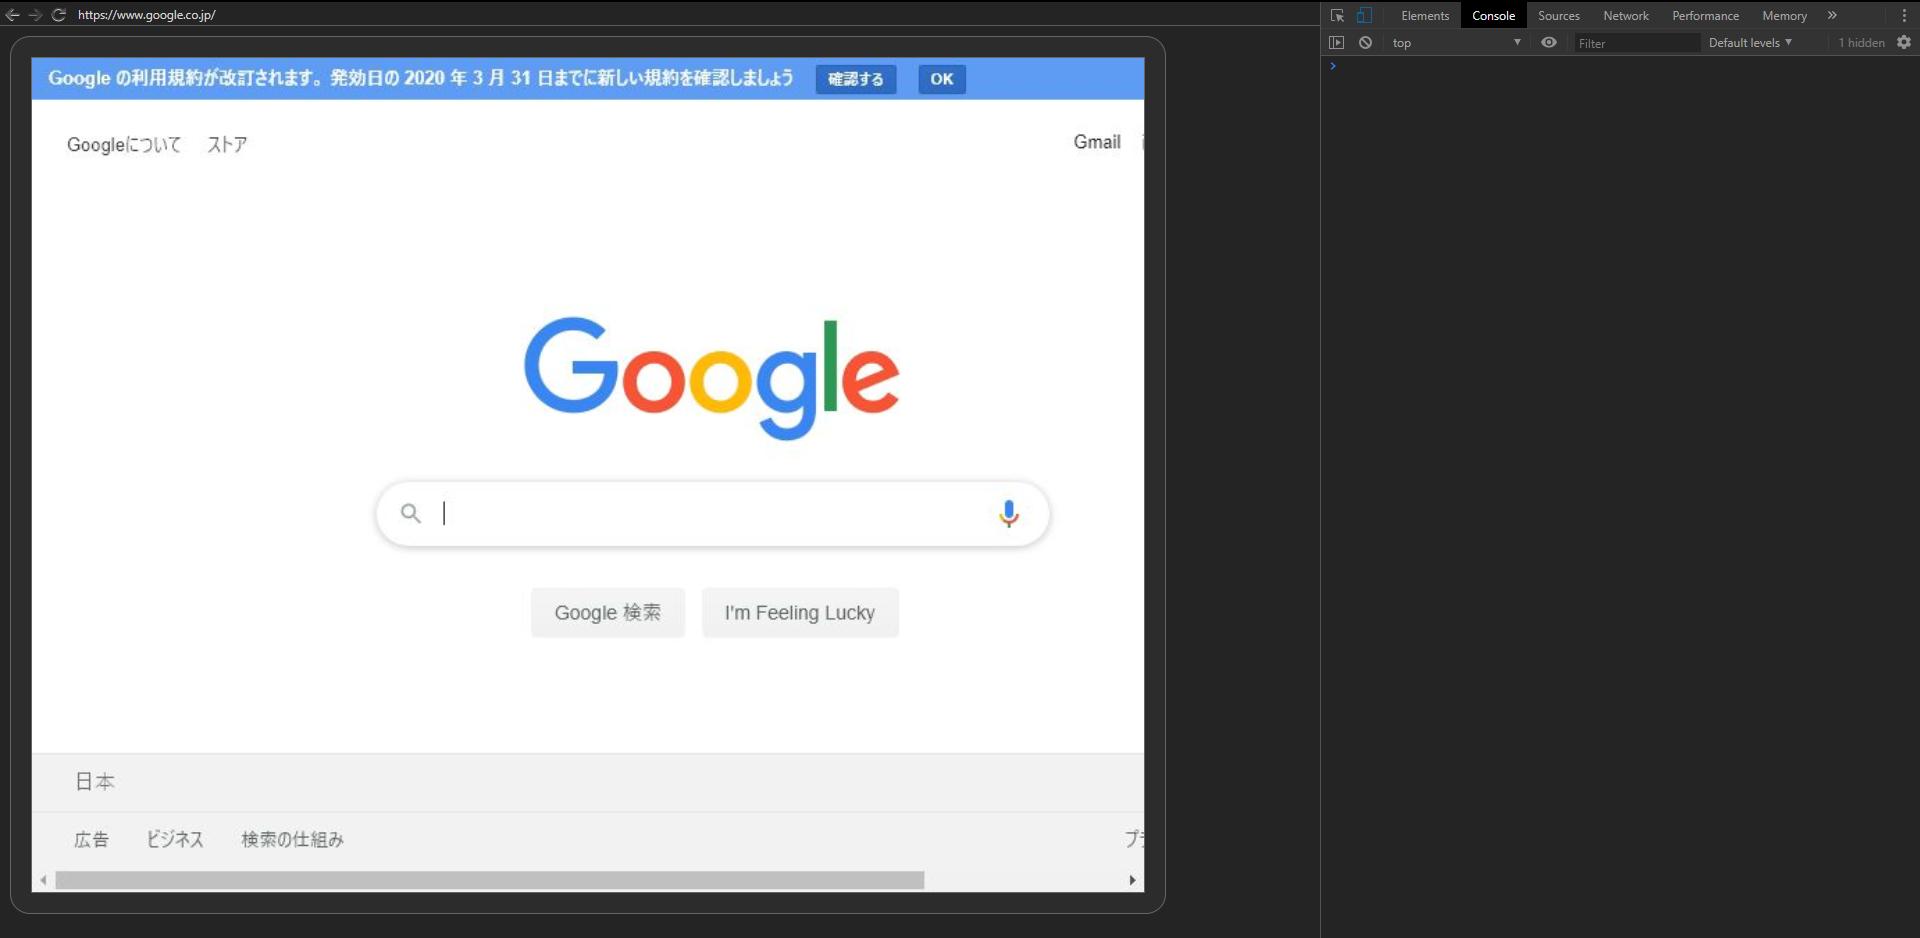 googletop.png